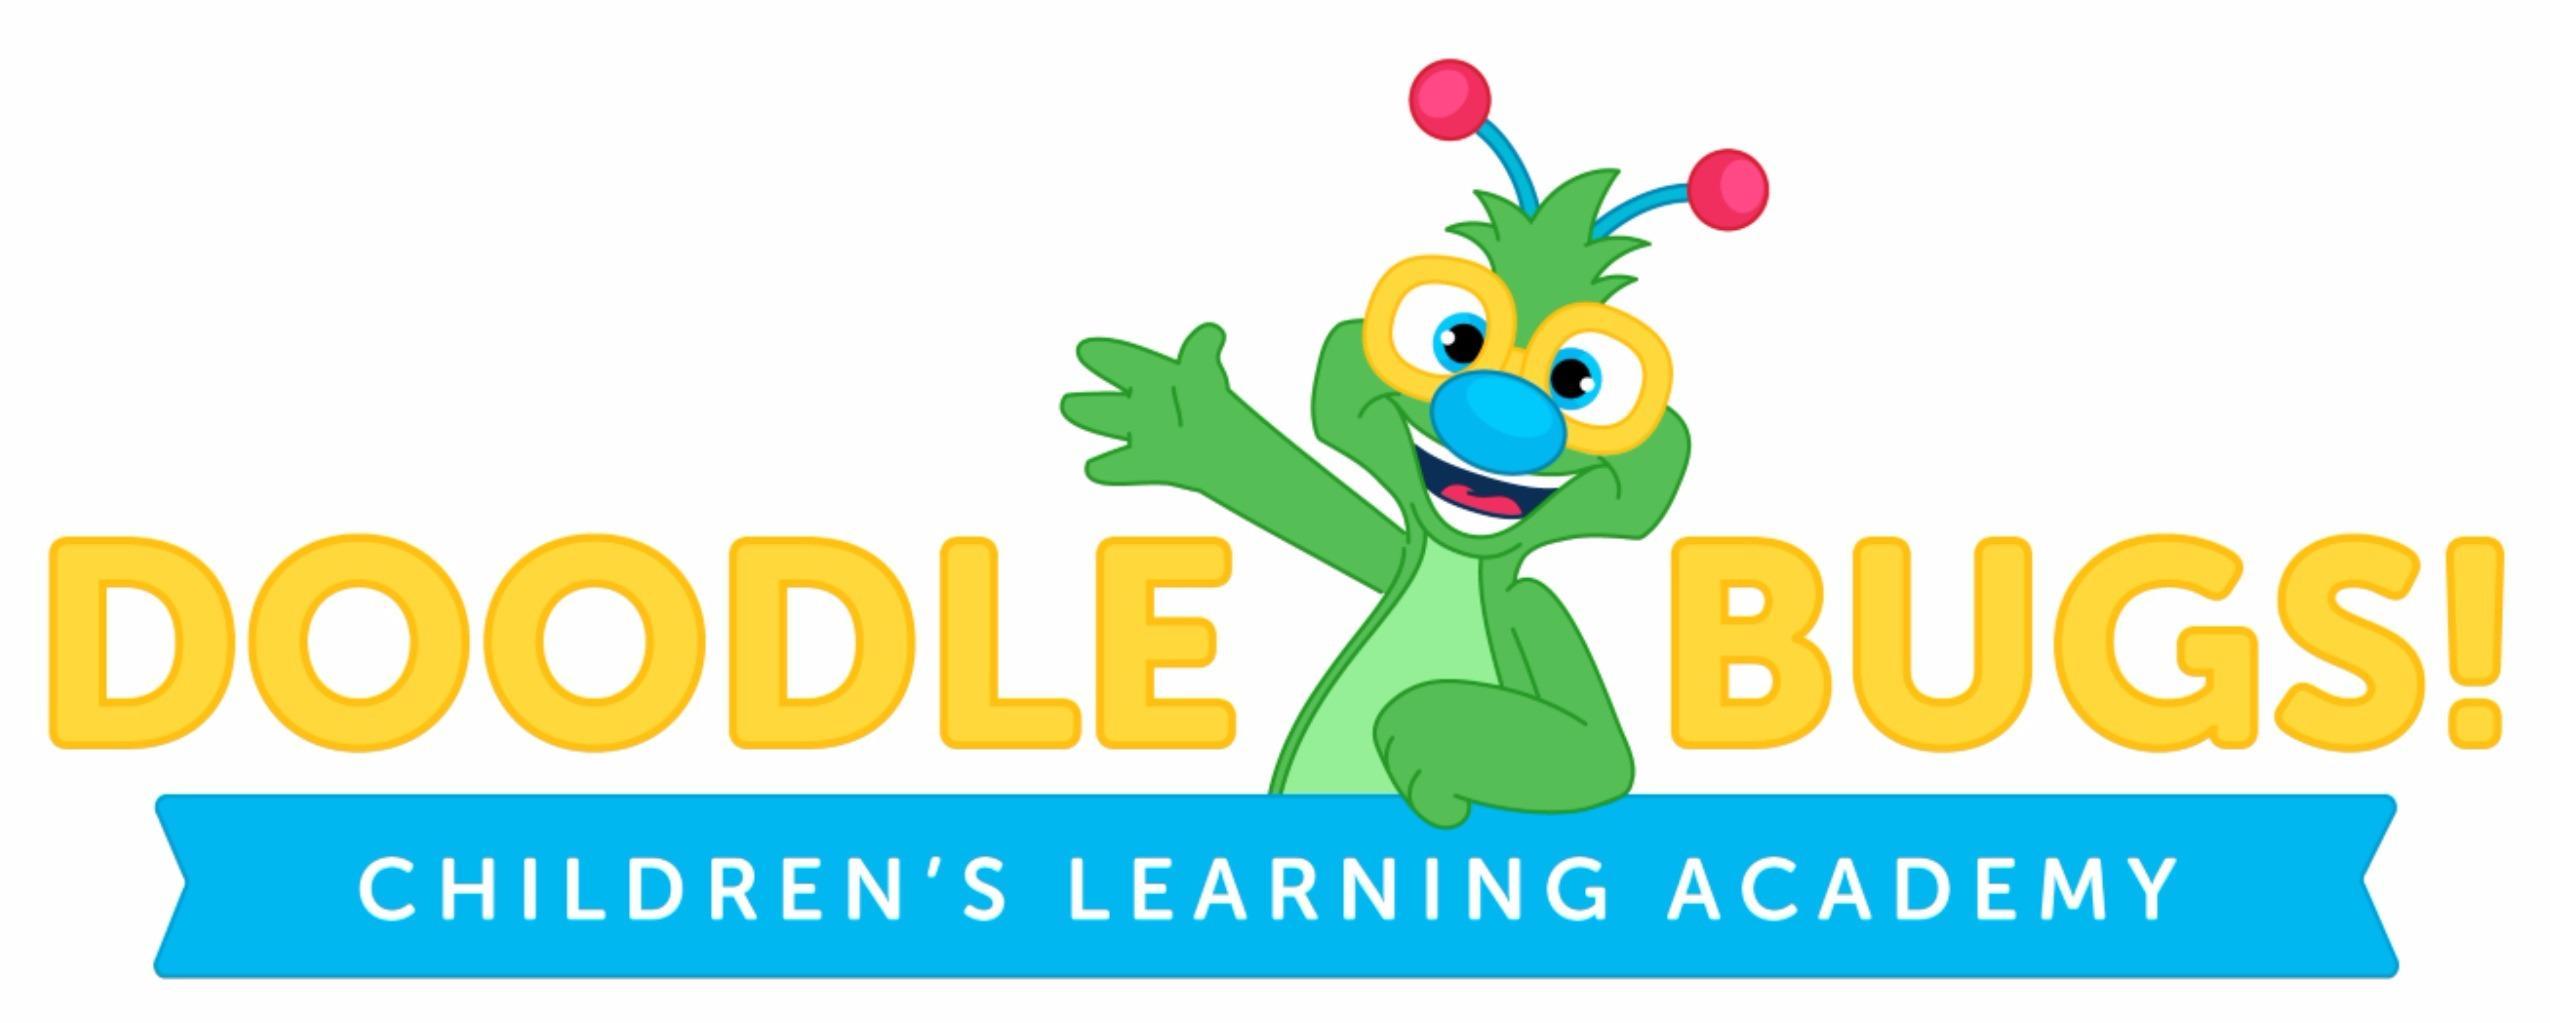 LMG Childcare LLC